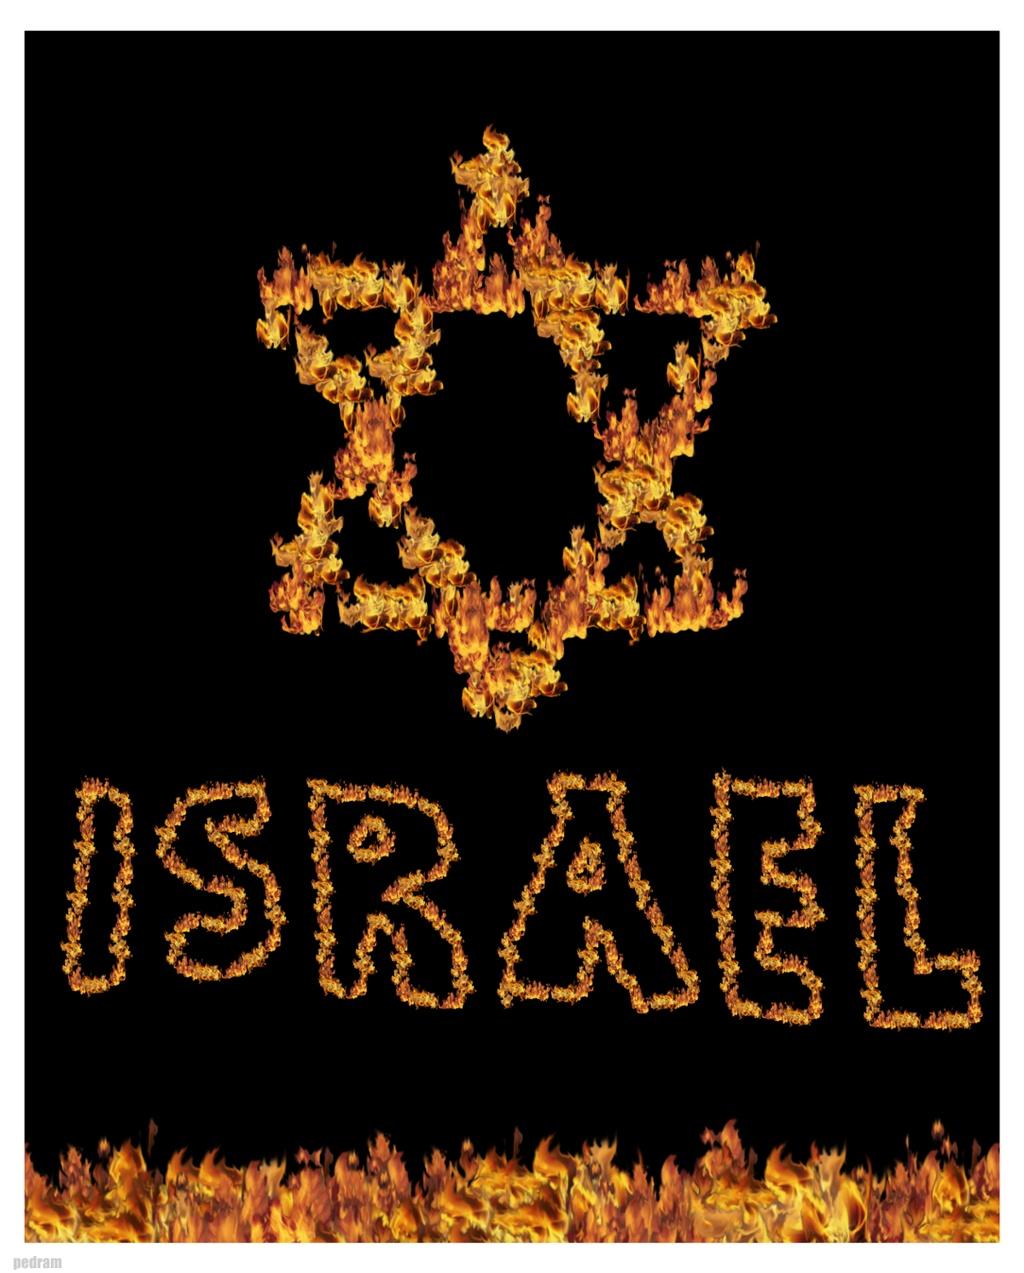 http://artintifada.files.wordpress.com/2009/01/israhell_by_israevil.jpg